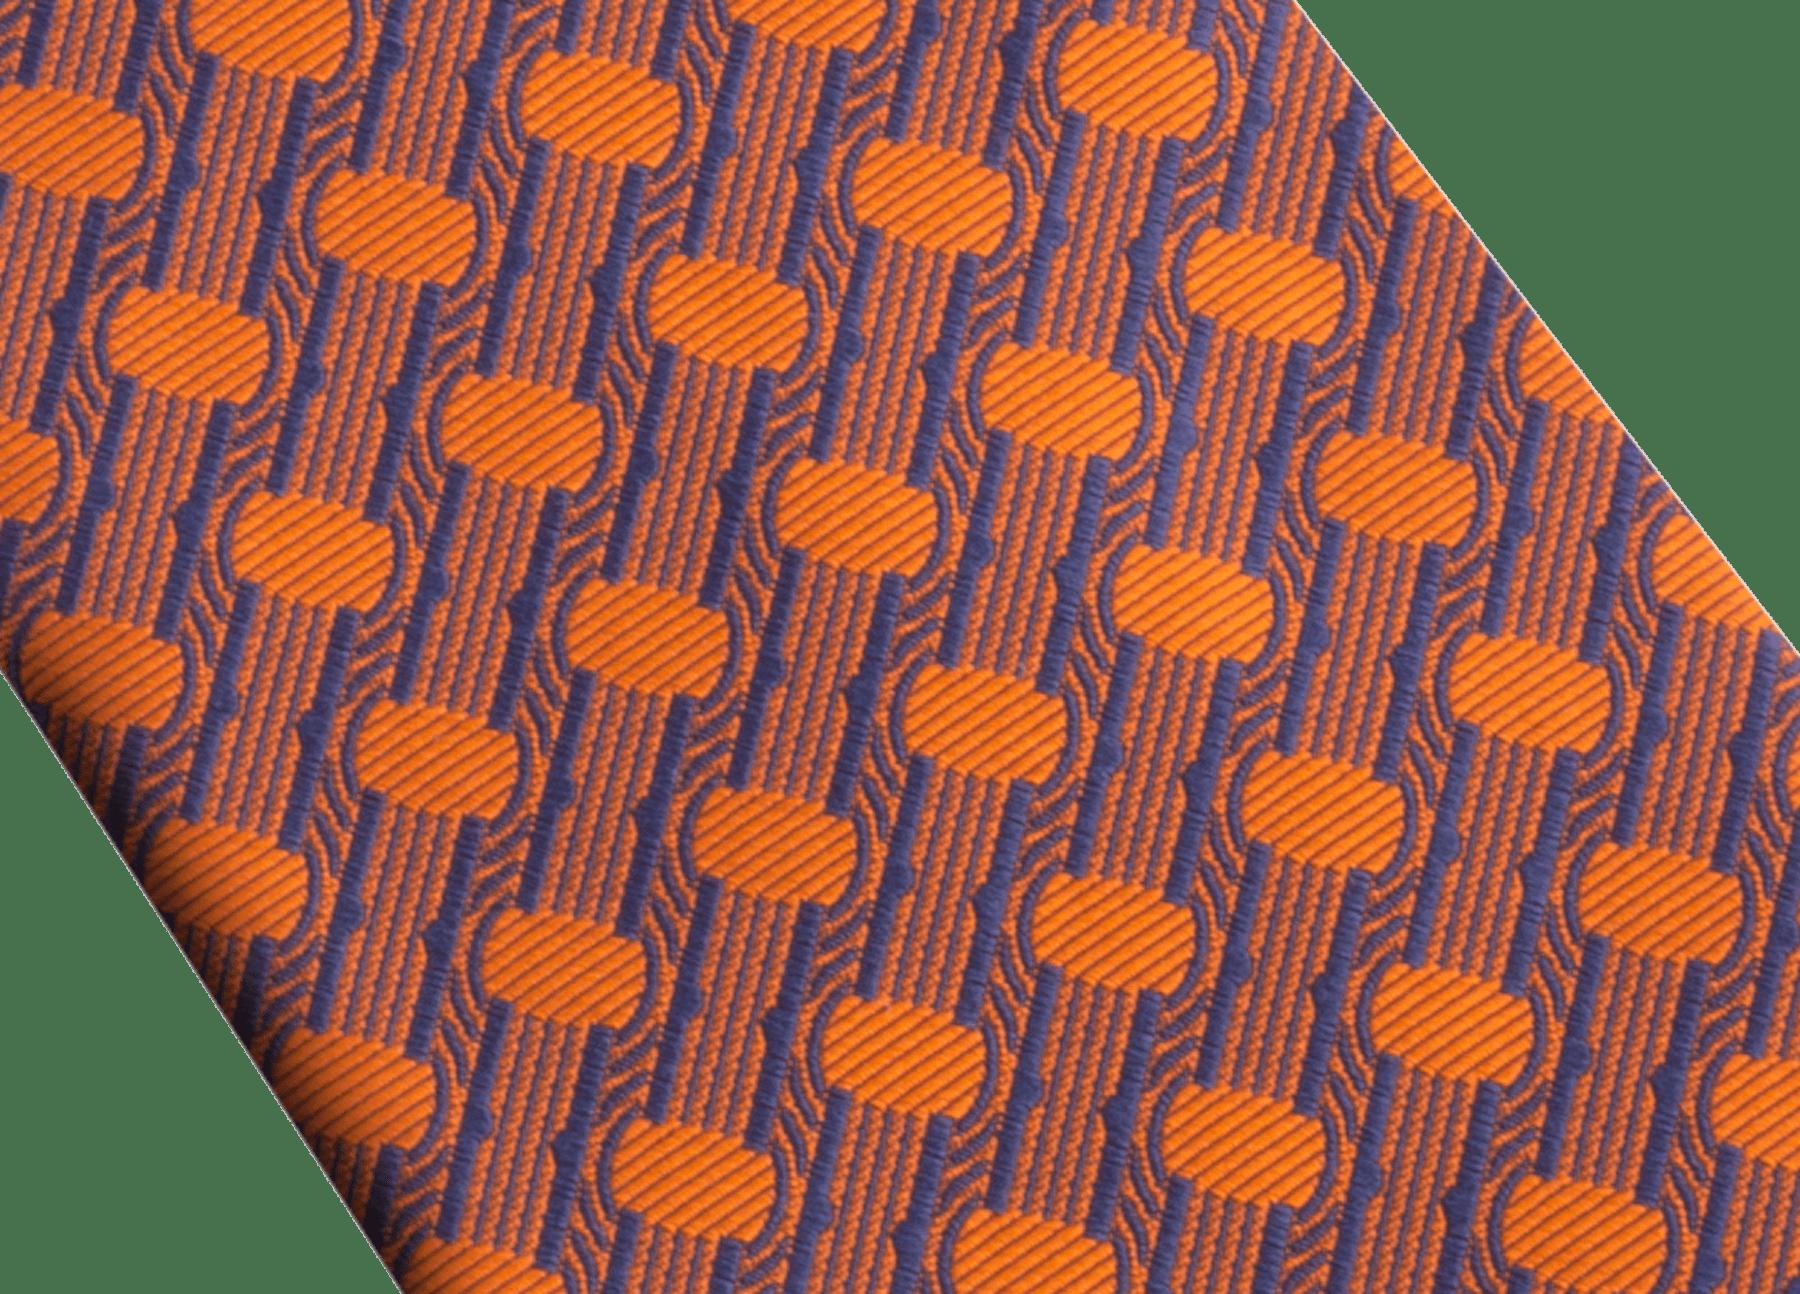 Saffron B.zero1 pattern seven-folds tie in fine silk. 243683 image 3